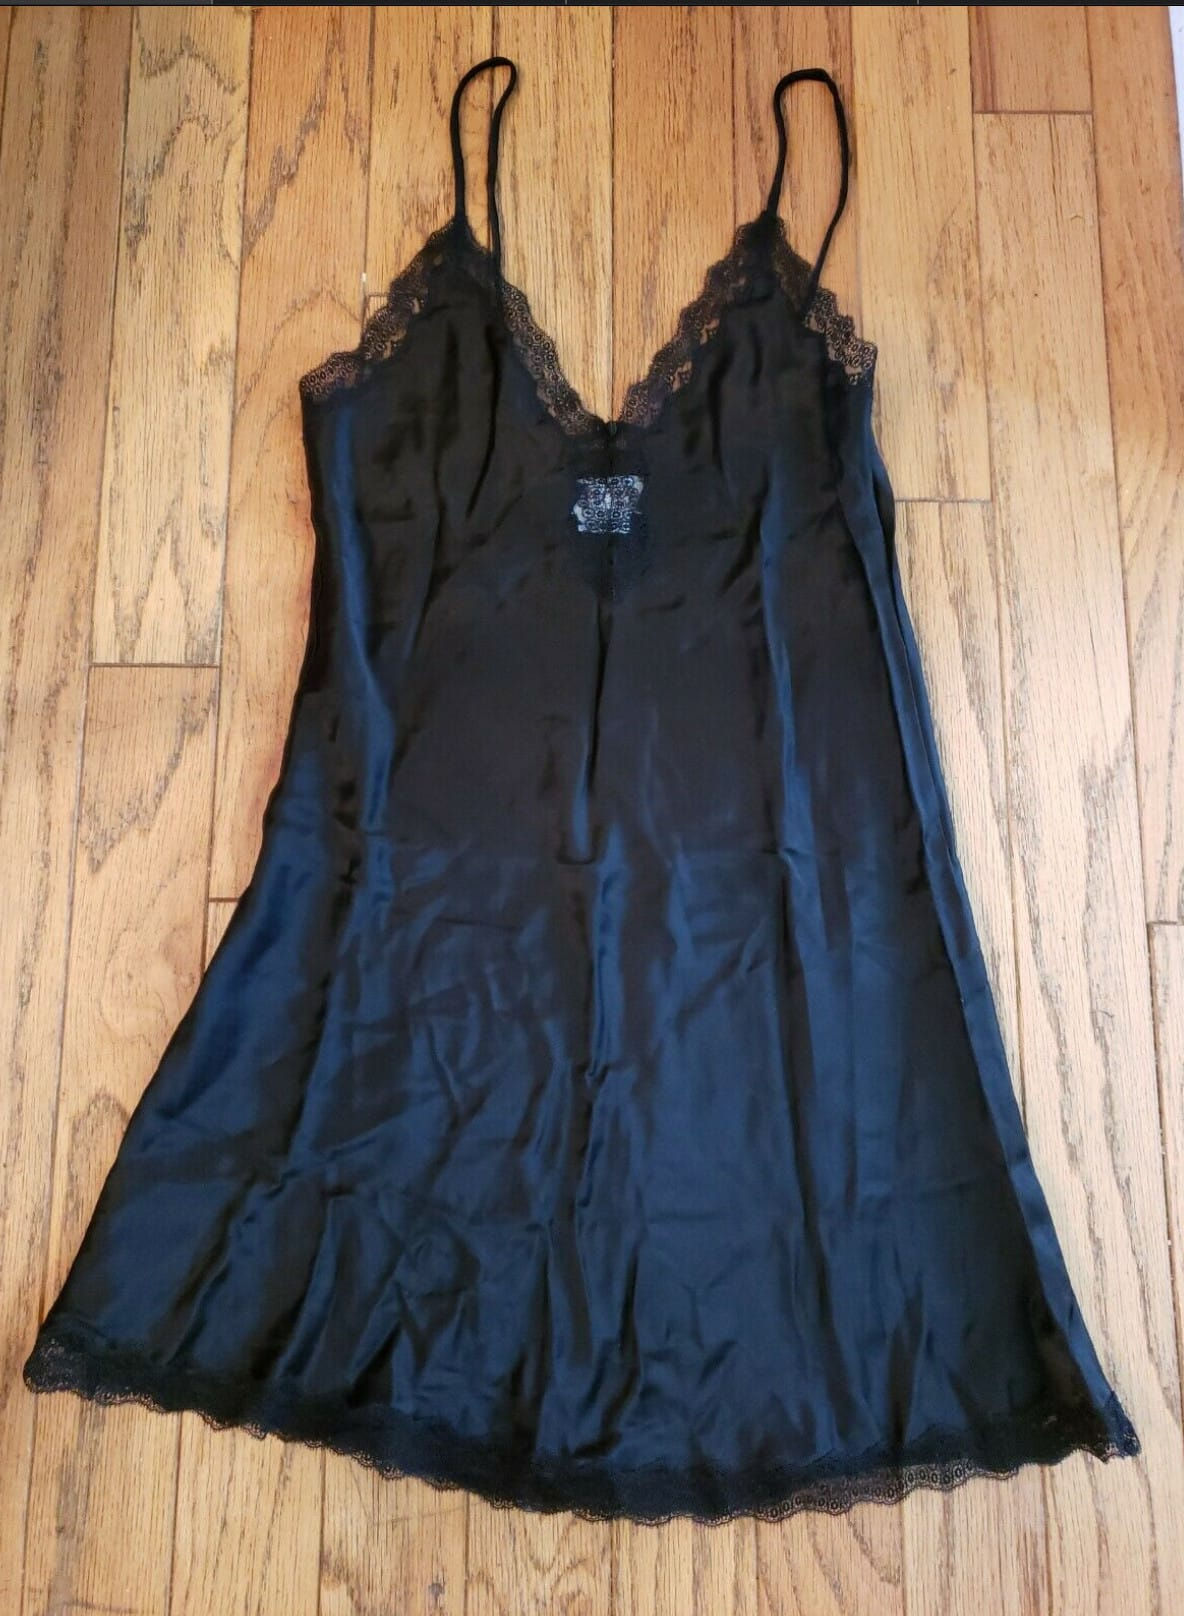 Vintage Ora Feder Silk Slip Camisole Lingerie Black With Lace Trim M